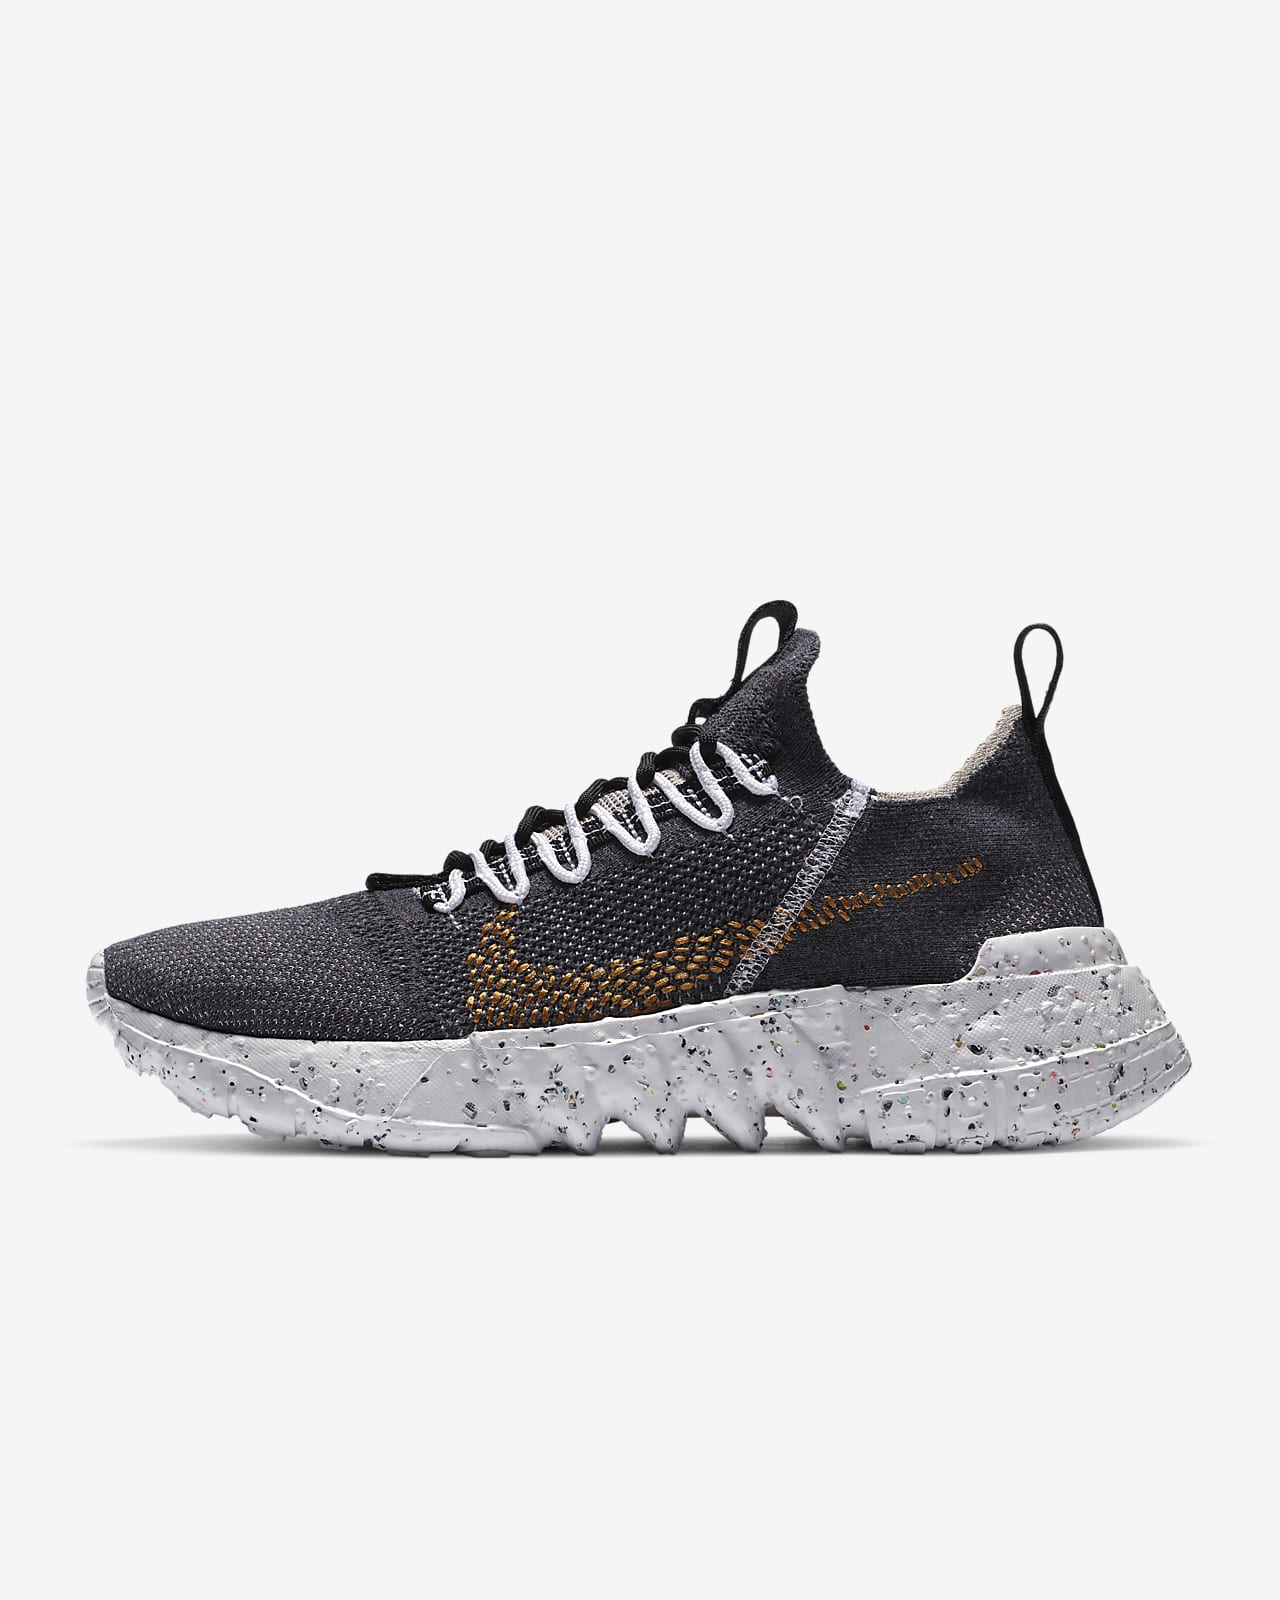 Nike Space Hippie 01 cipő